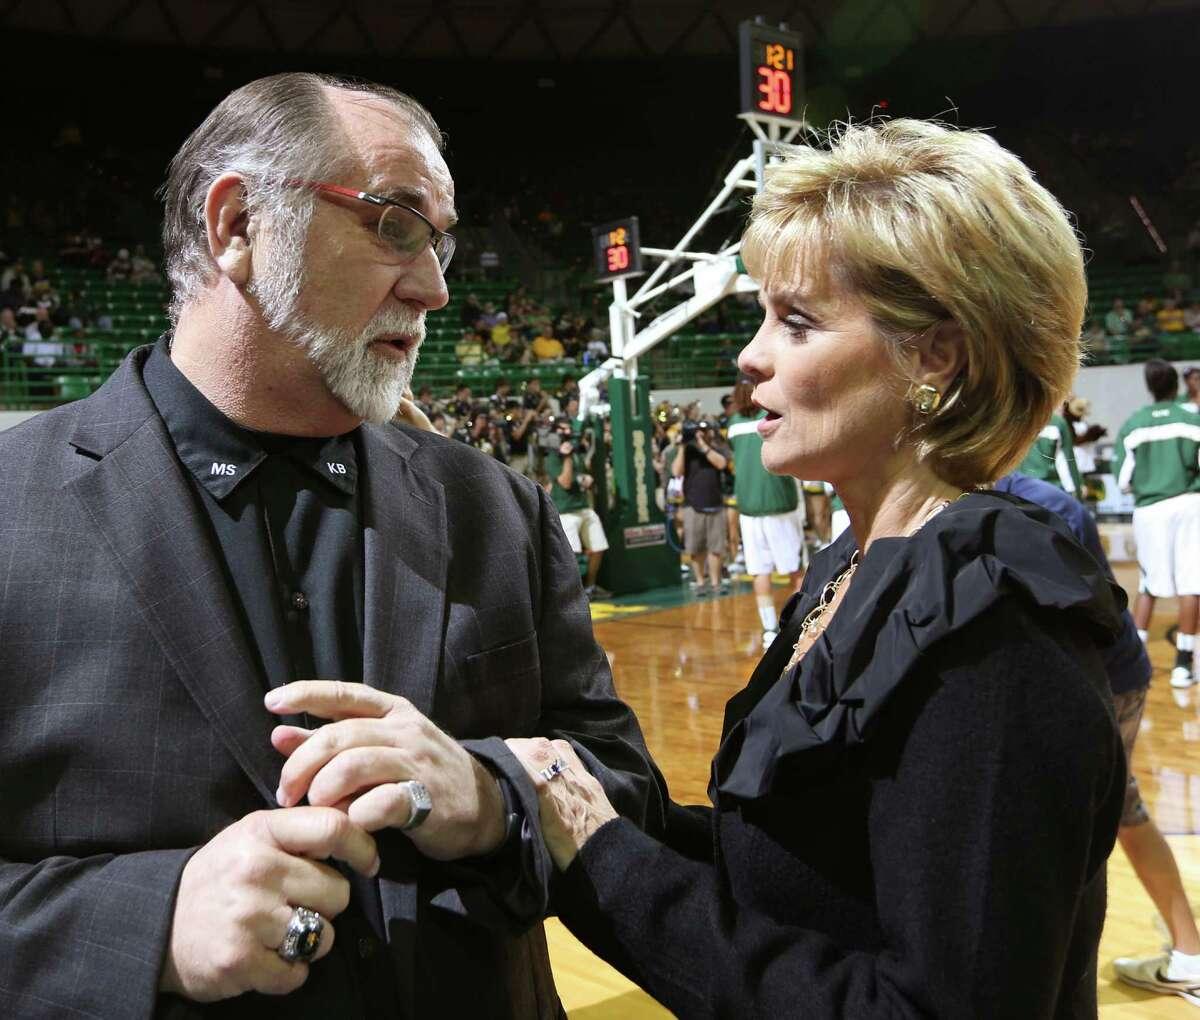 Lamar coach Larry Tidwell, left, visits with Baylor coach Kim Mulkey before an NCAA college basketball game, Friday, Nov. 9, 2012, in Waco, Texas. (AP Photo/Waco Tribune Herald, Rod Aydelotte)